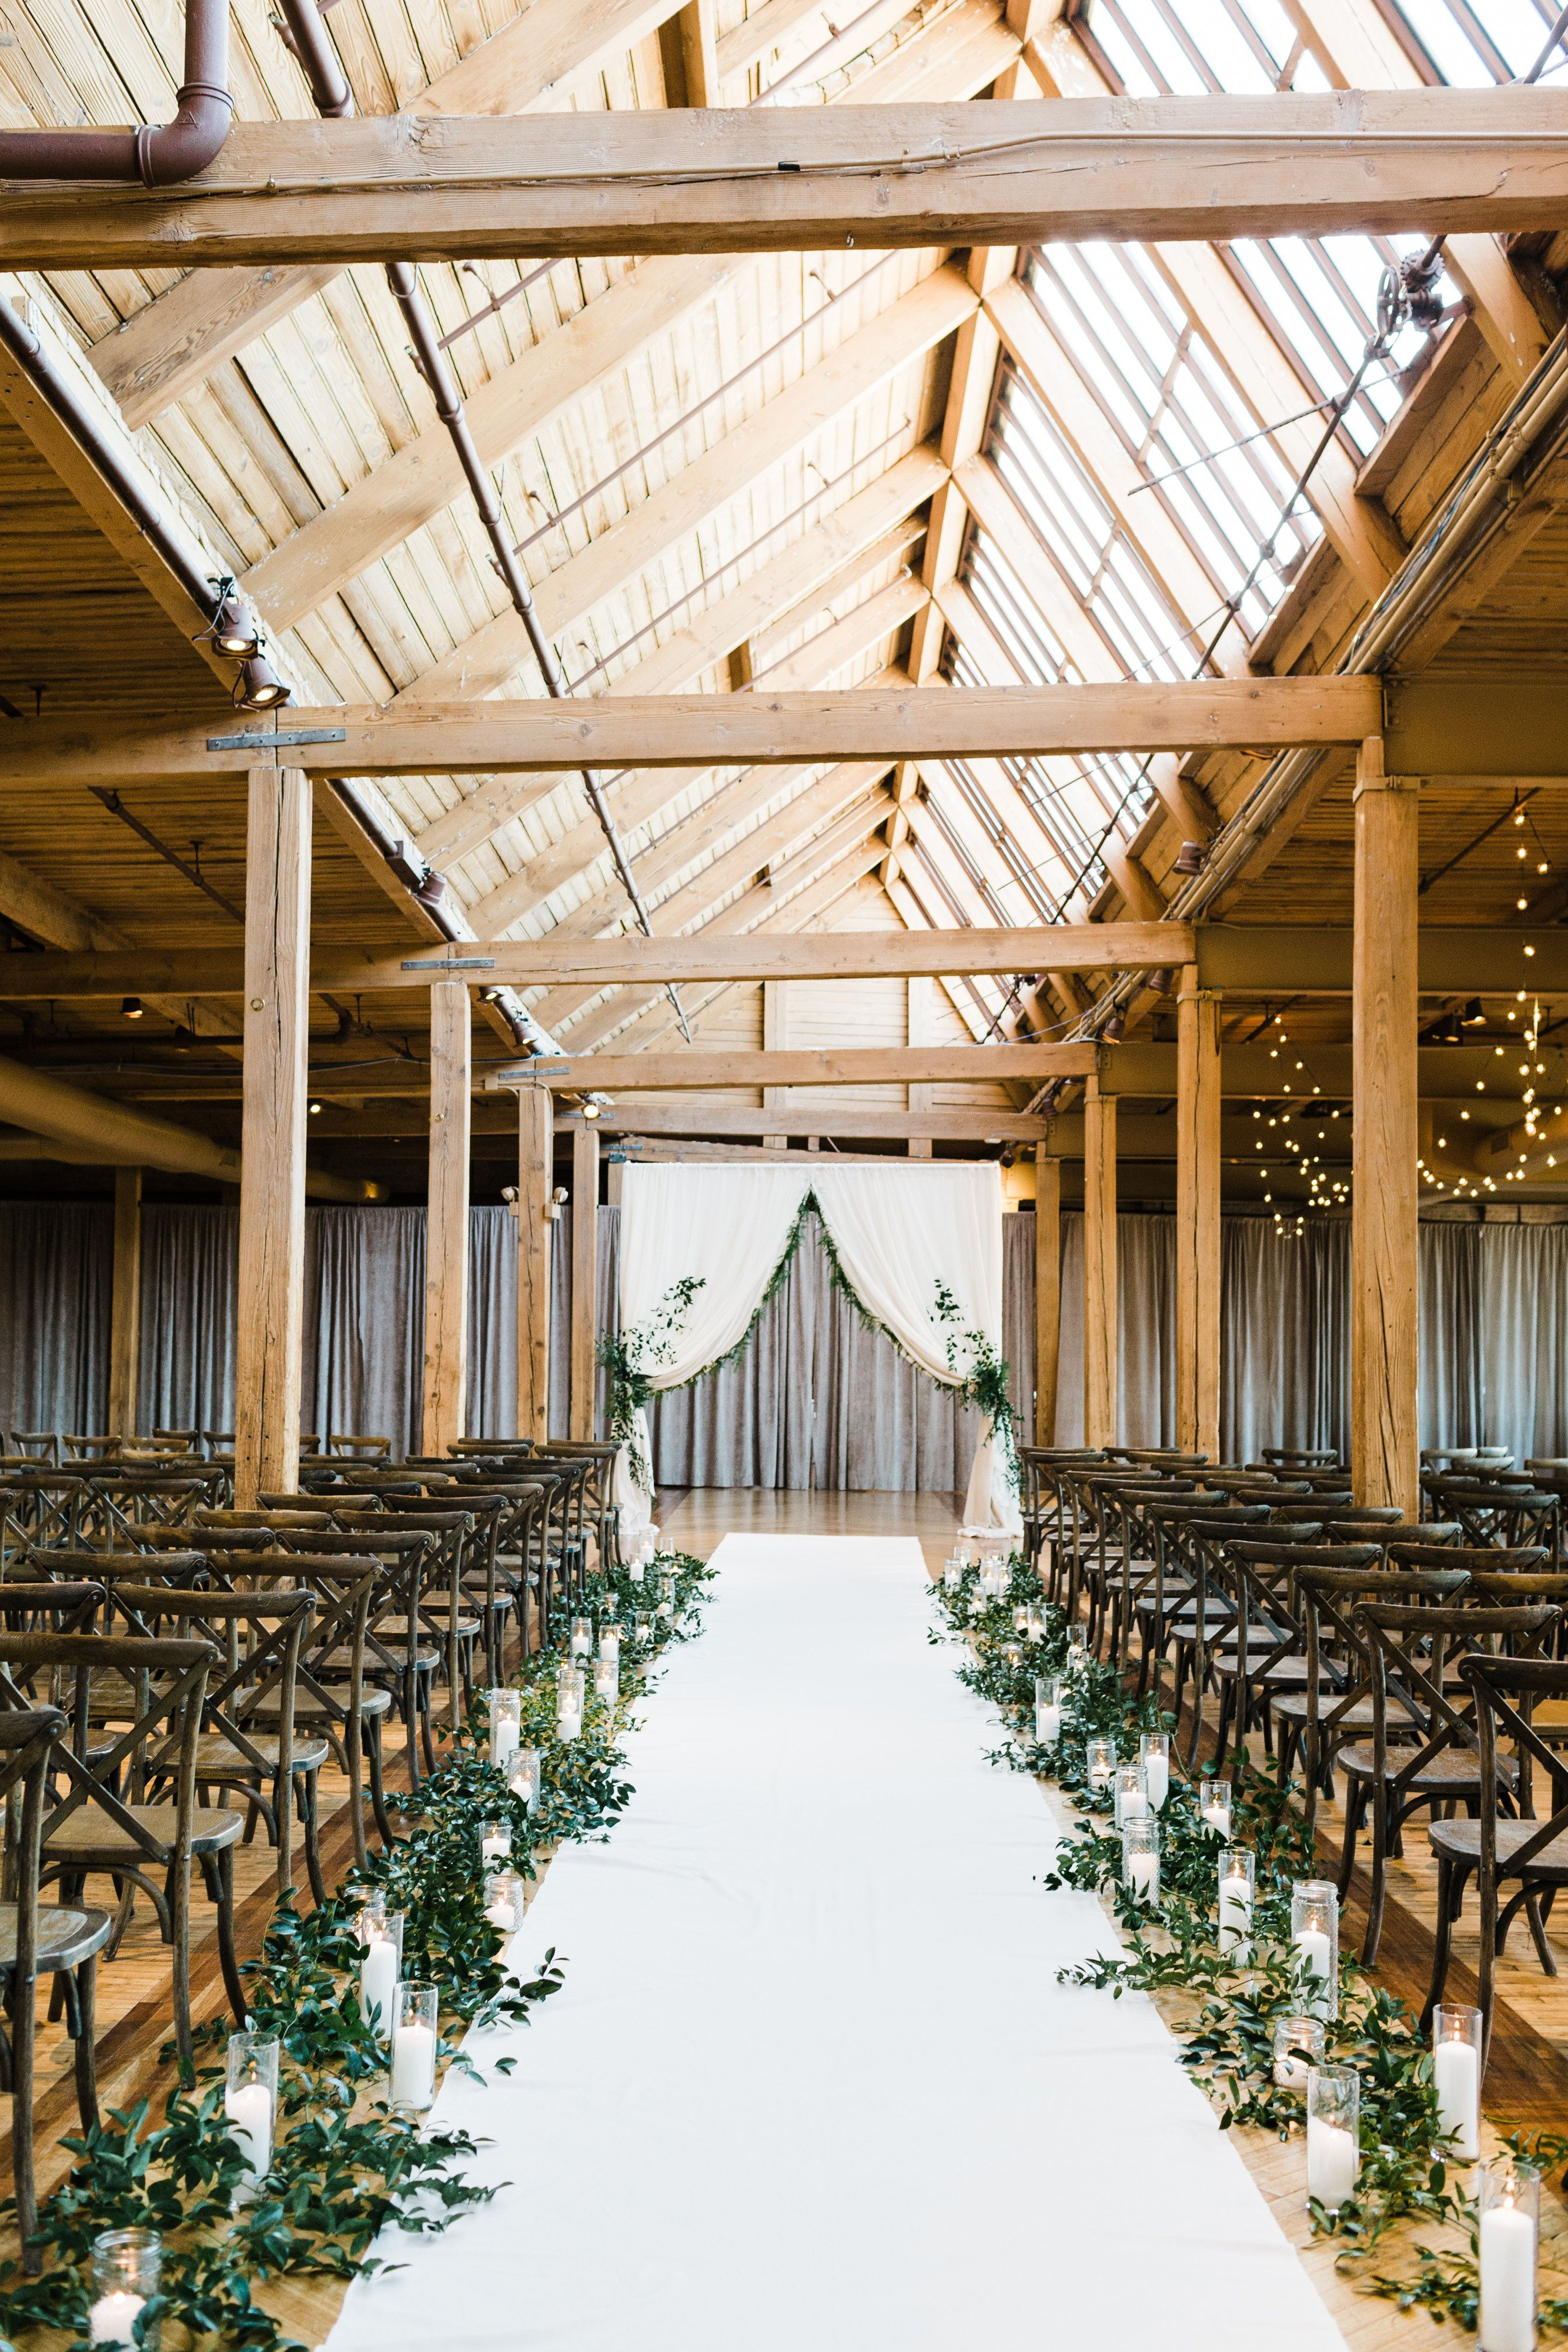 Amanda Ben S Wedding In The Skyline Loft Bridgeportartcenter Skylineloft Chicagoloft Loft Bridgeport Art Center Wedding Reception Decorations Kings Table